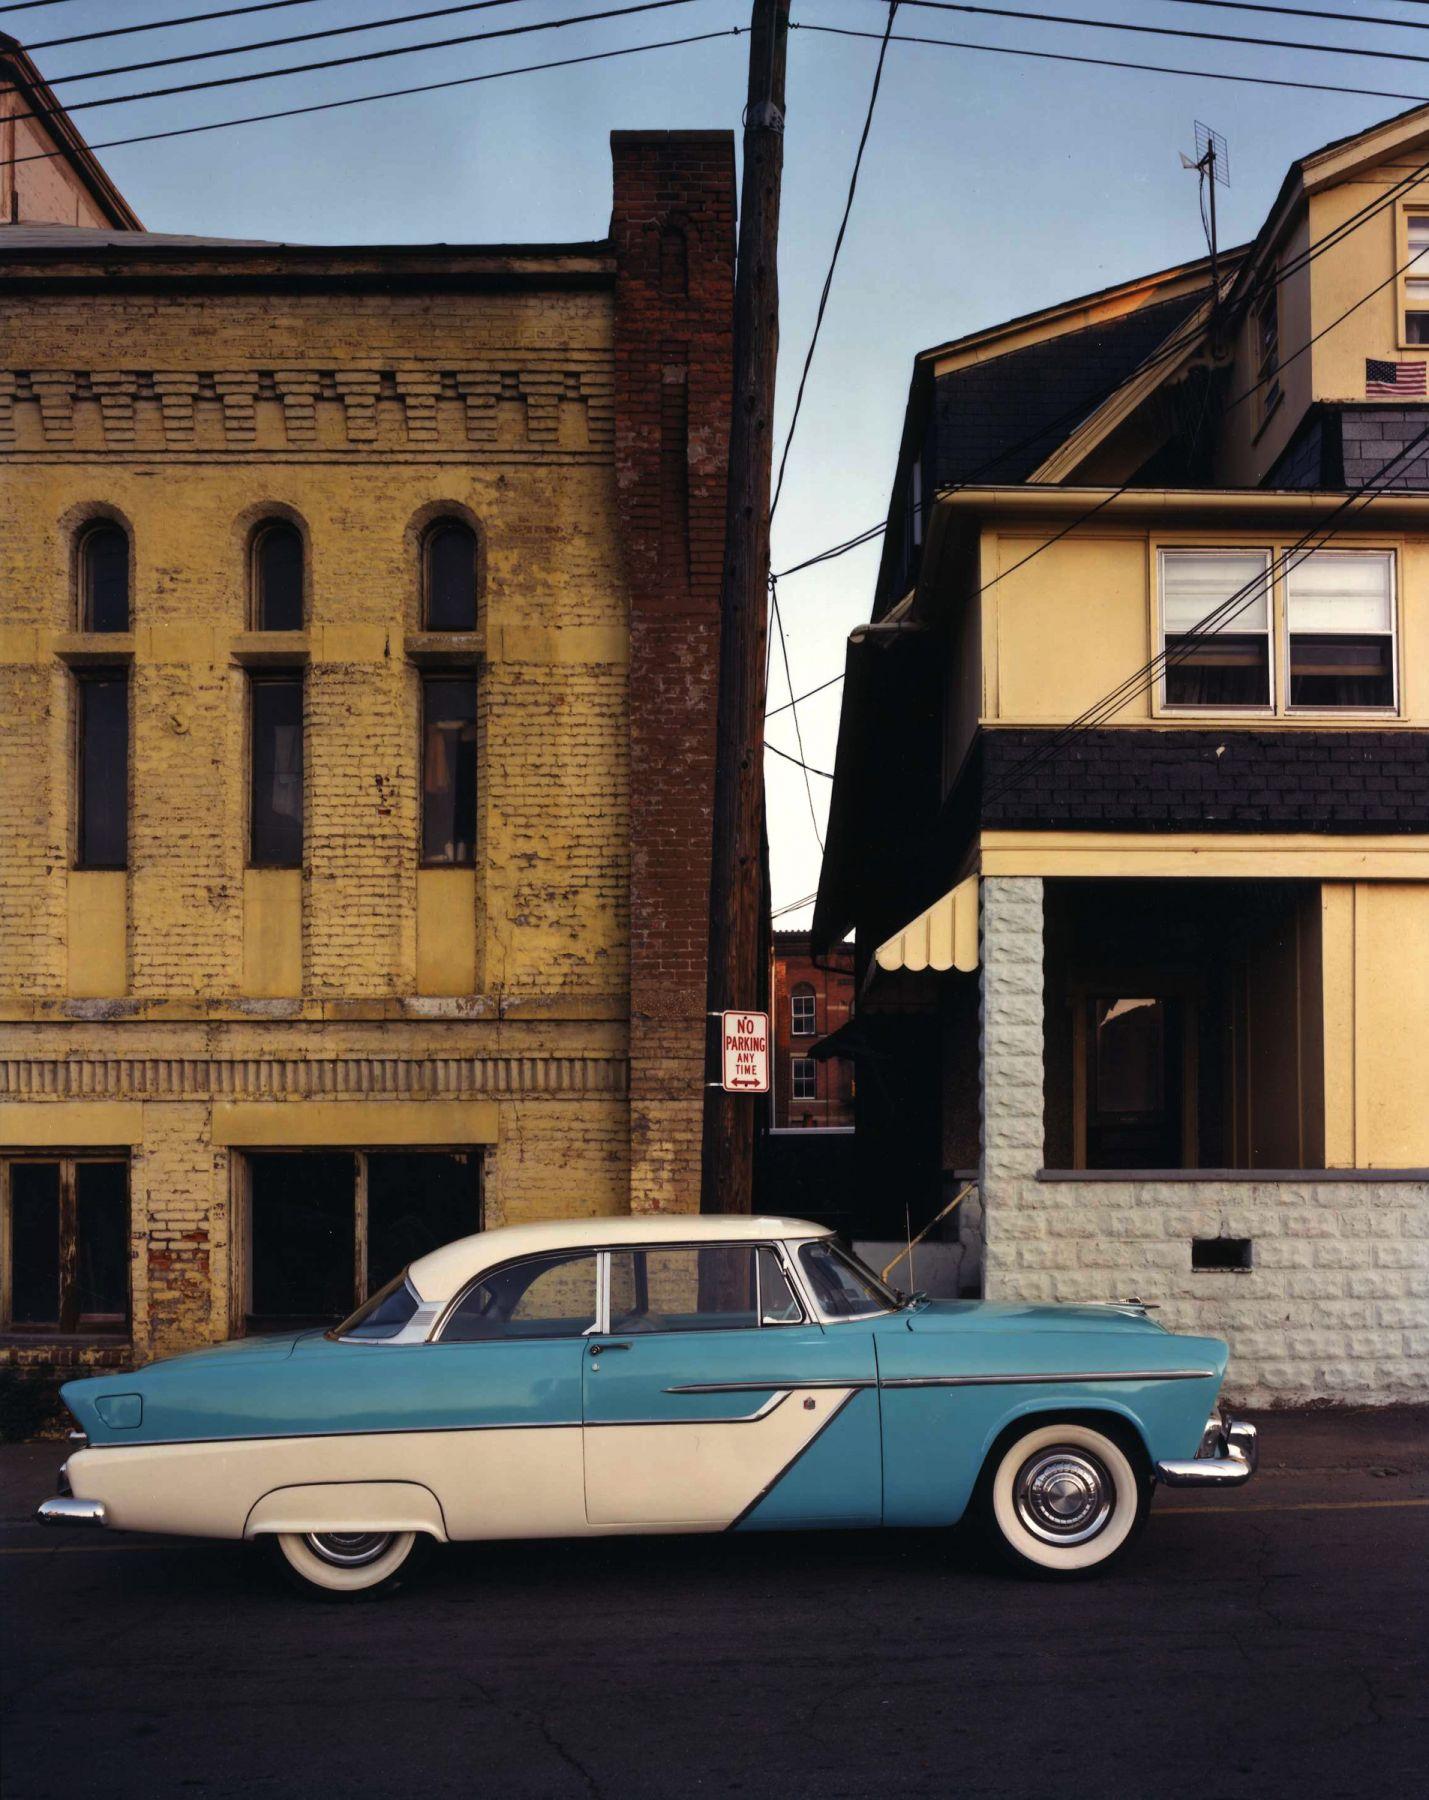 Bruce Wrighton 1955 Plymouth Belvedere Binghamton, NY